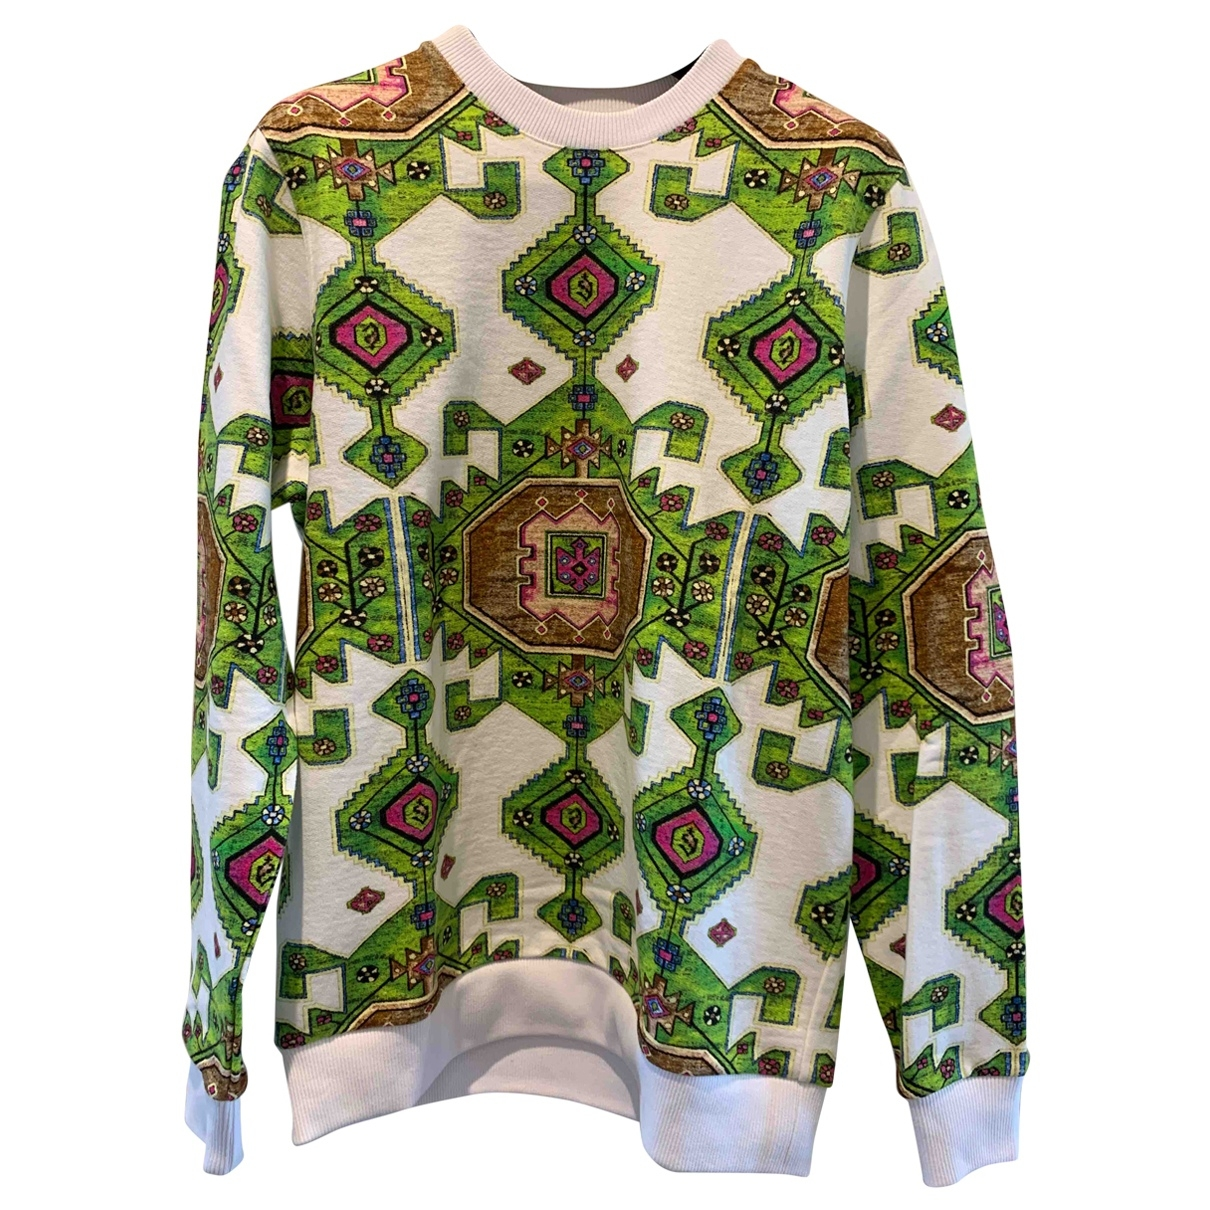 Givenchy - Polos   pour homme en coton - multicolore